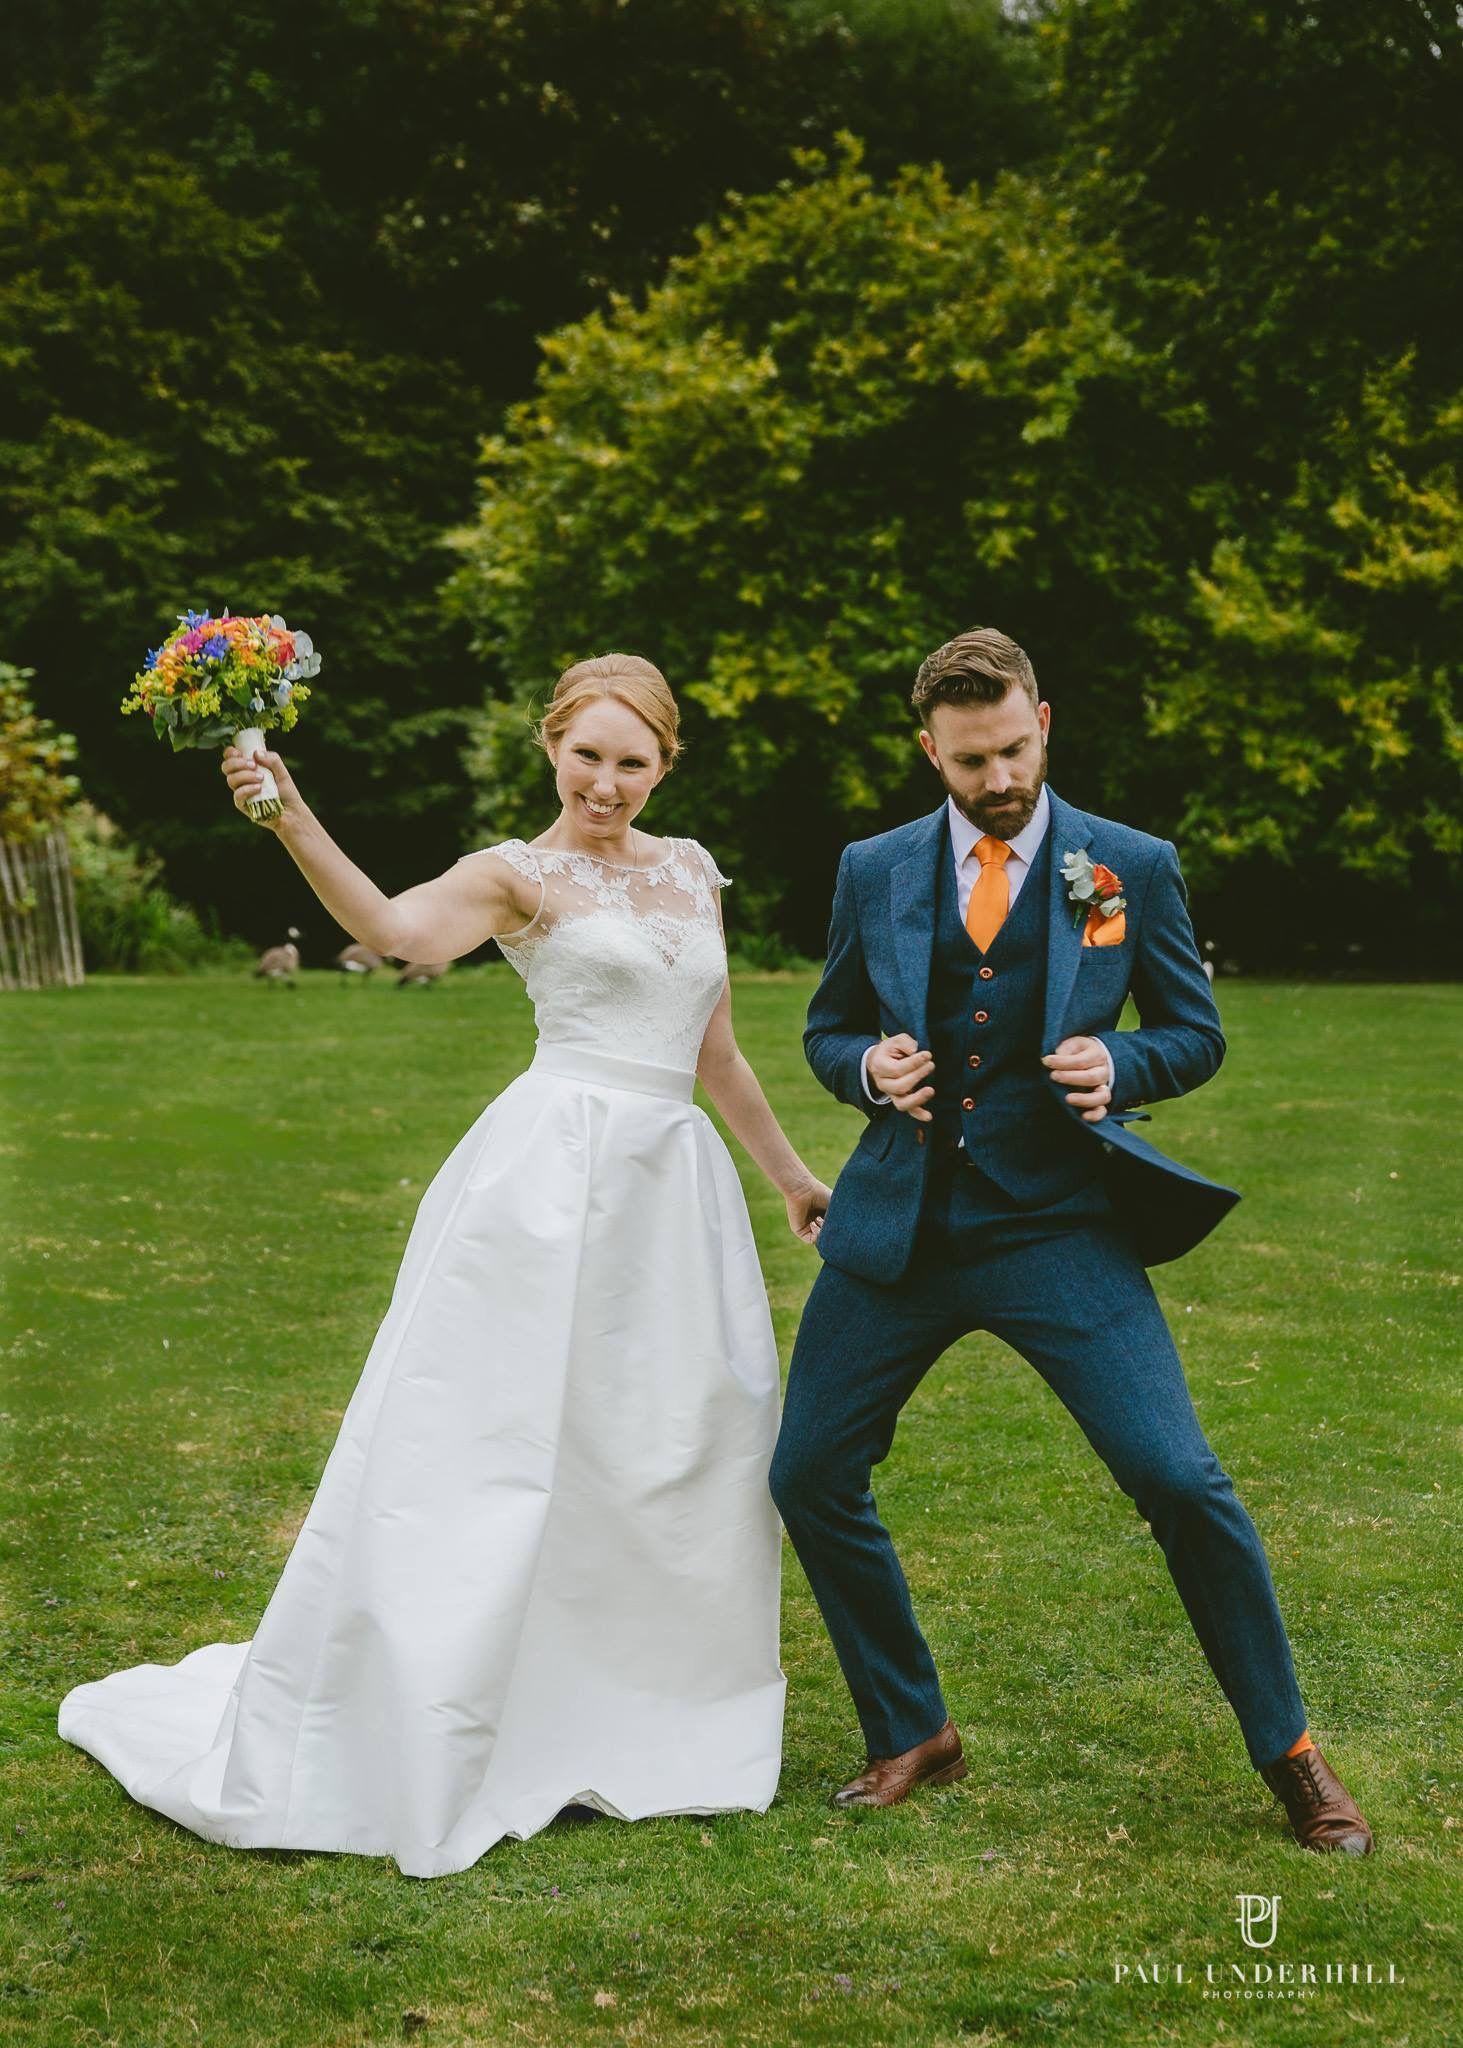 I Want This Suit Tweed Wedding Suits Tweed Wedding Wedding Suits